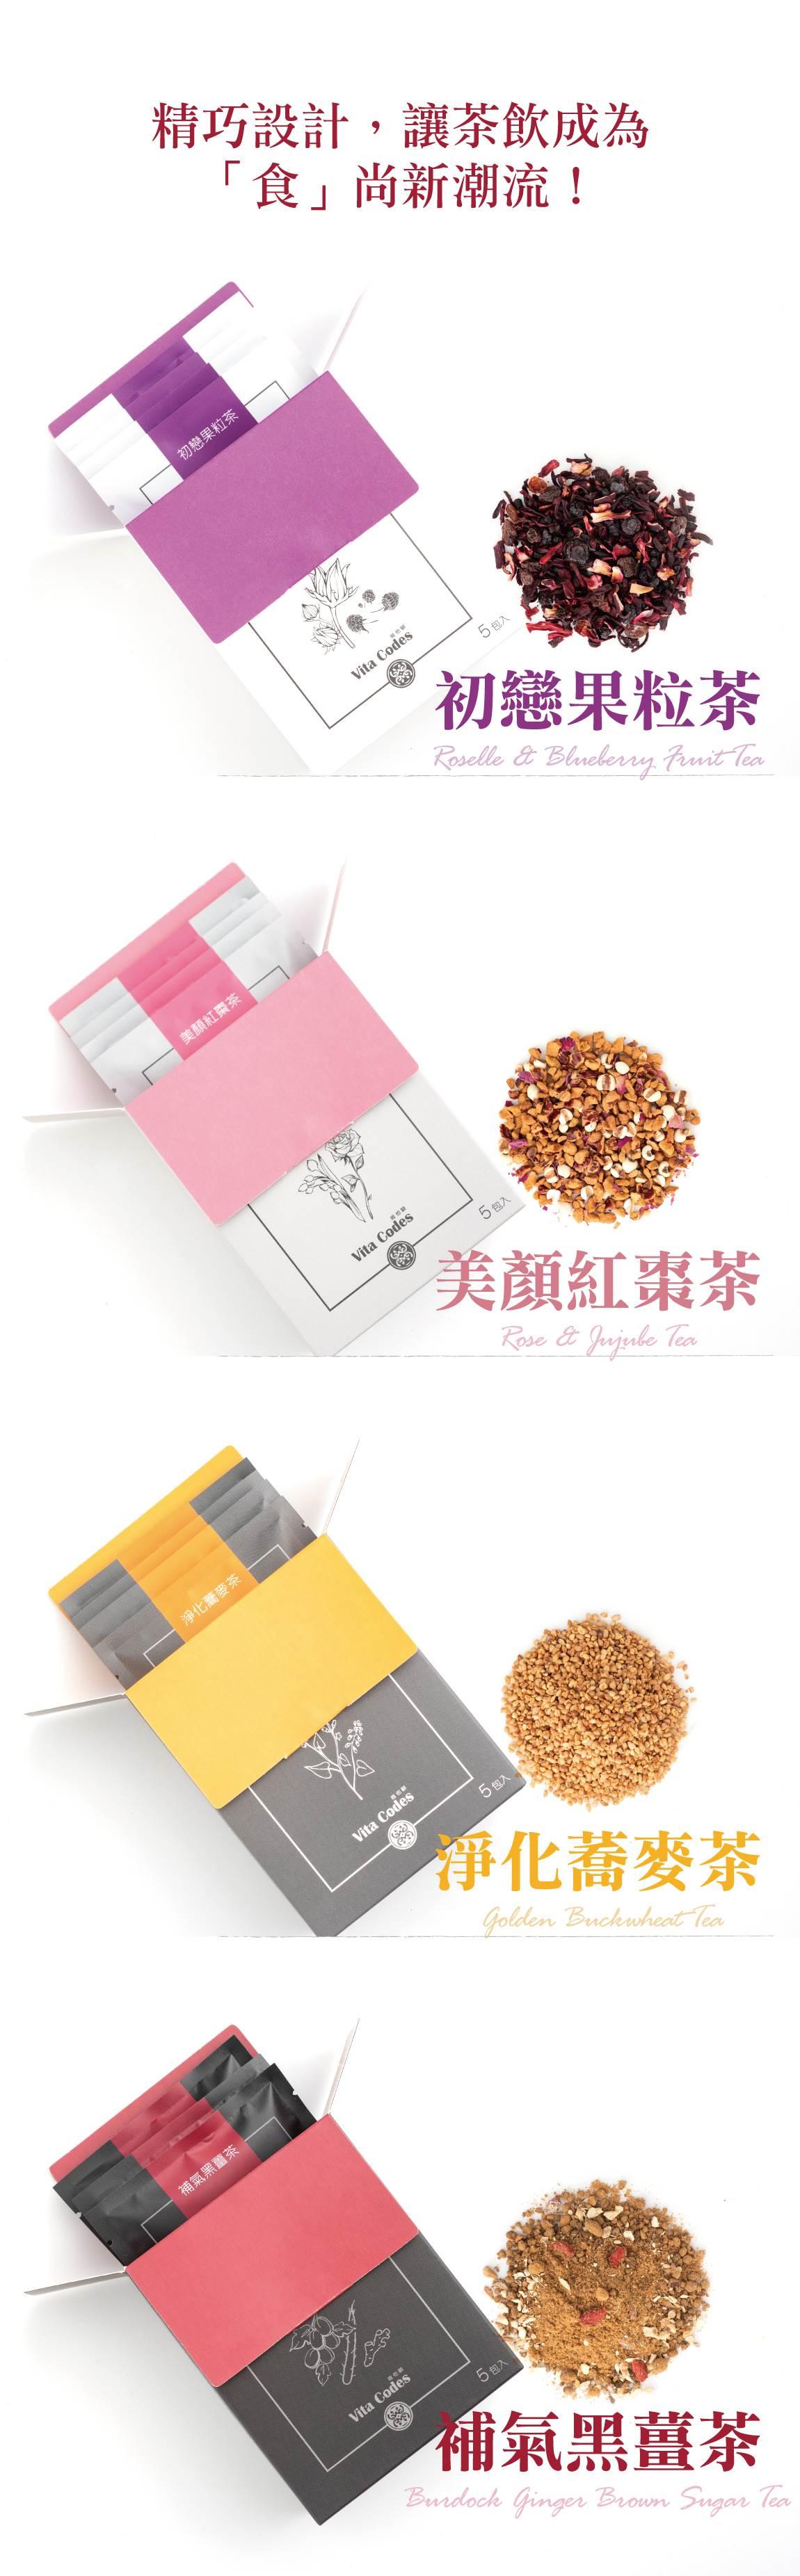 VitaCodes美顏茶-產品介紹10-美顏茶設計款-食尚新潮流